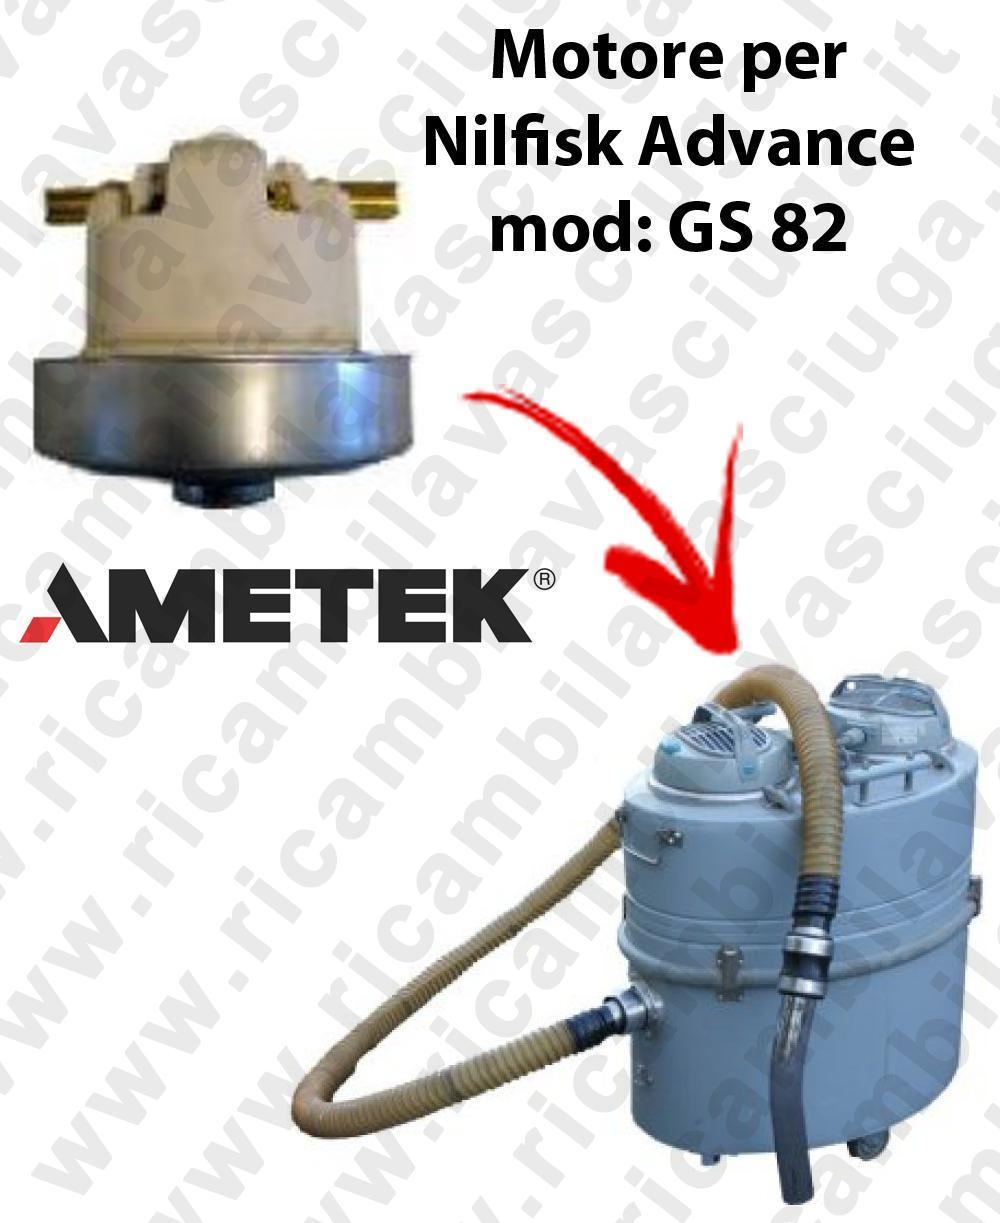 GS 82 Saugmotor AMETEK für Staubsauger NILFISK ADVANCE